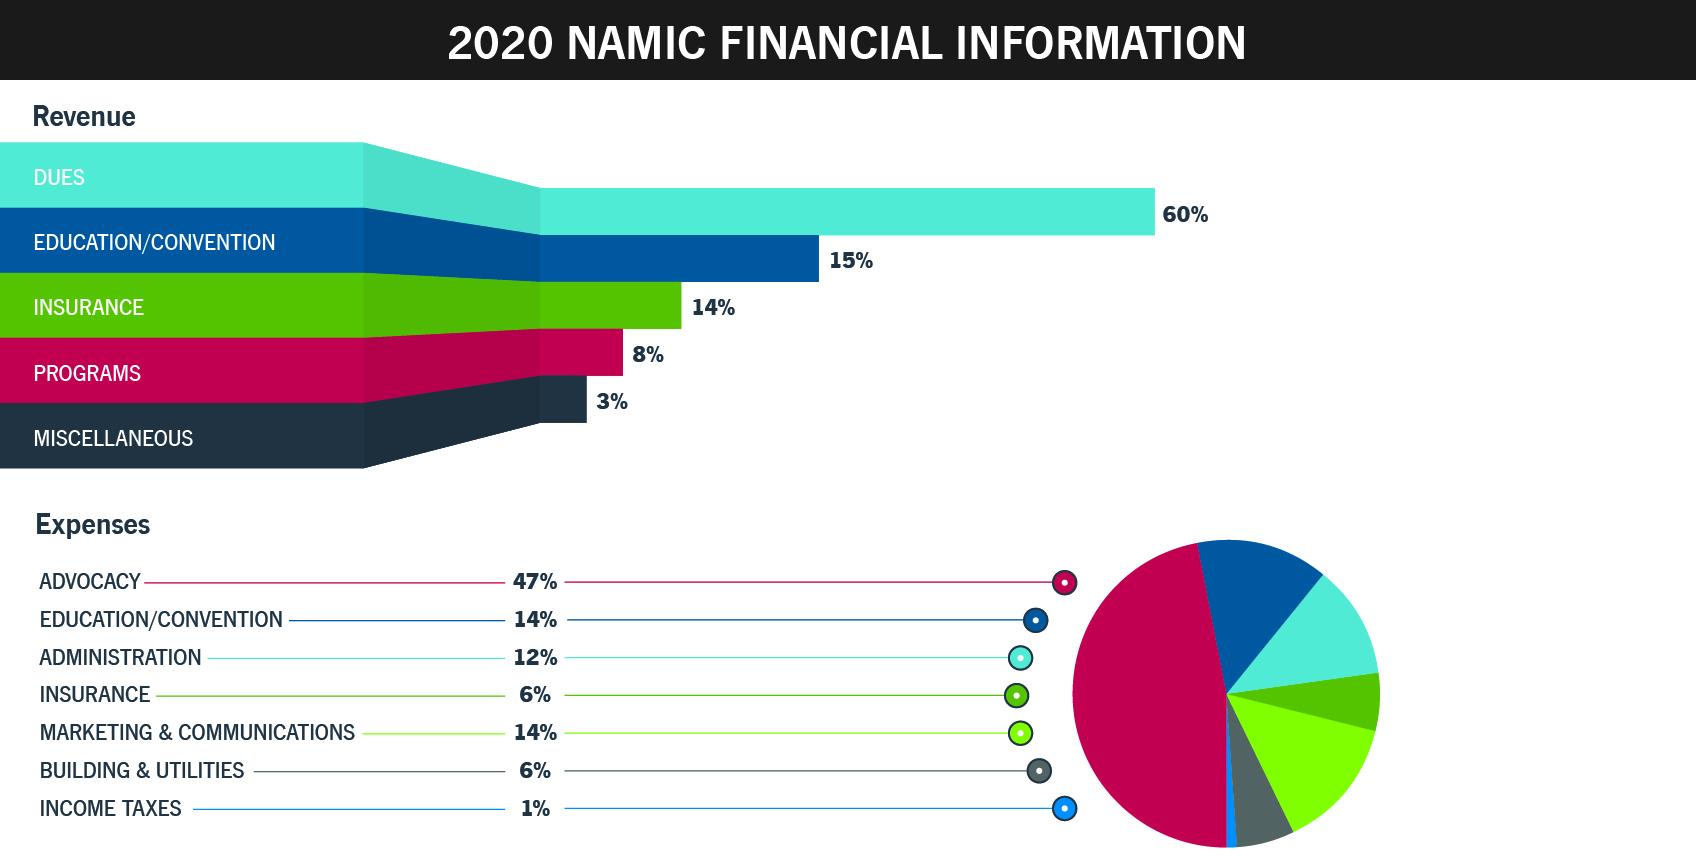 NAMIC 2020 Financial Info